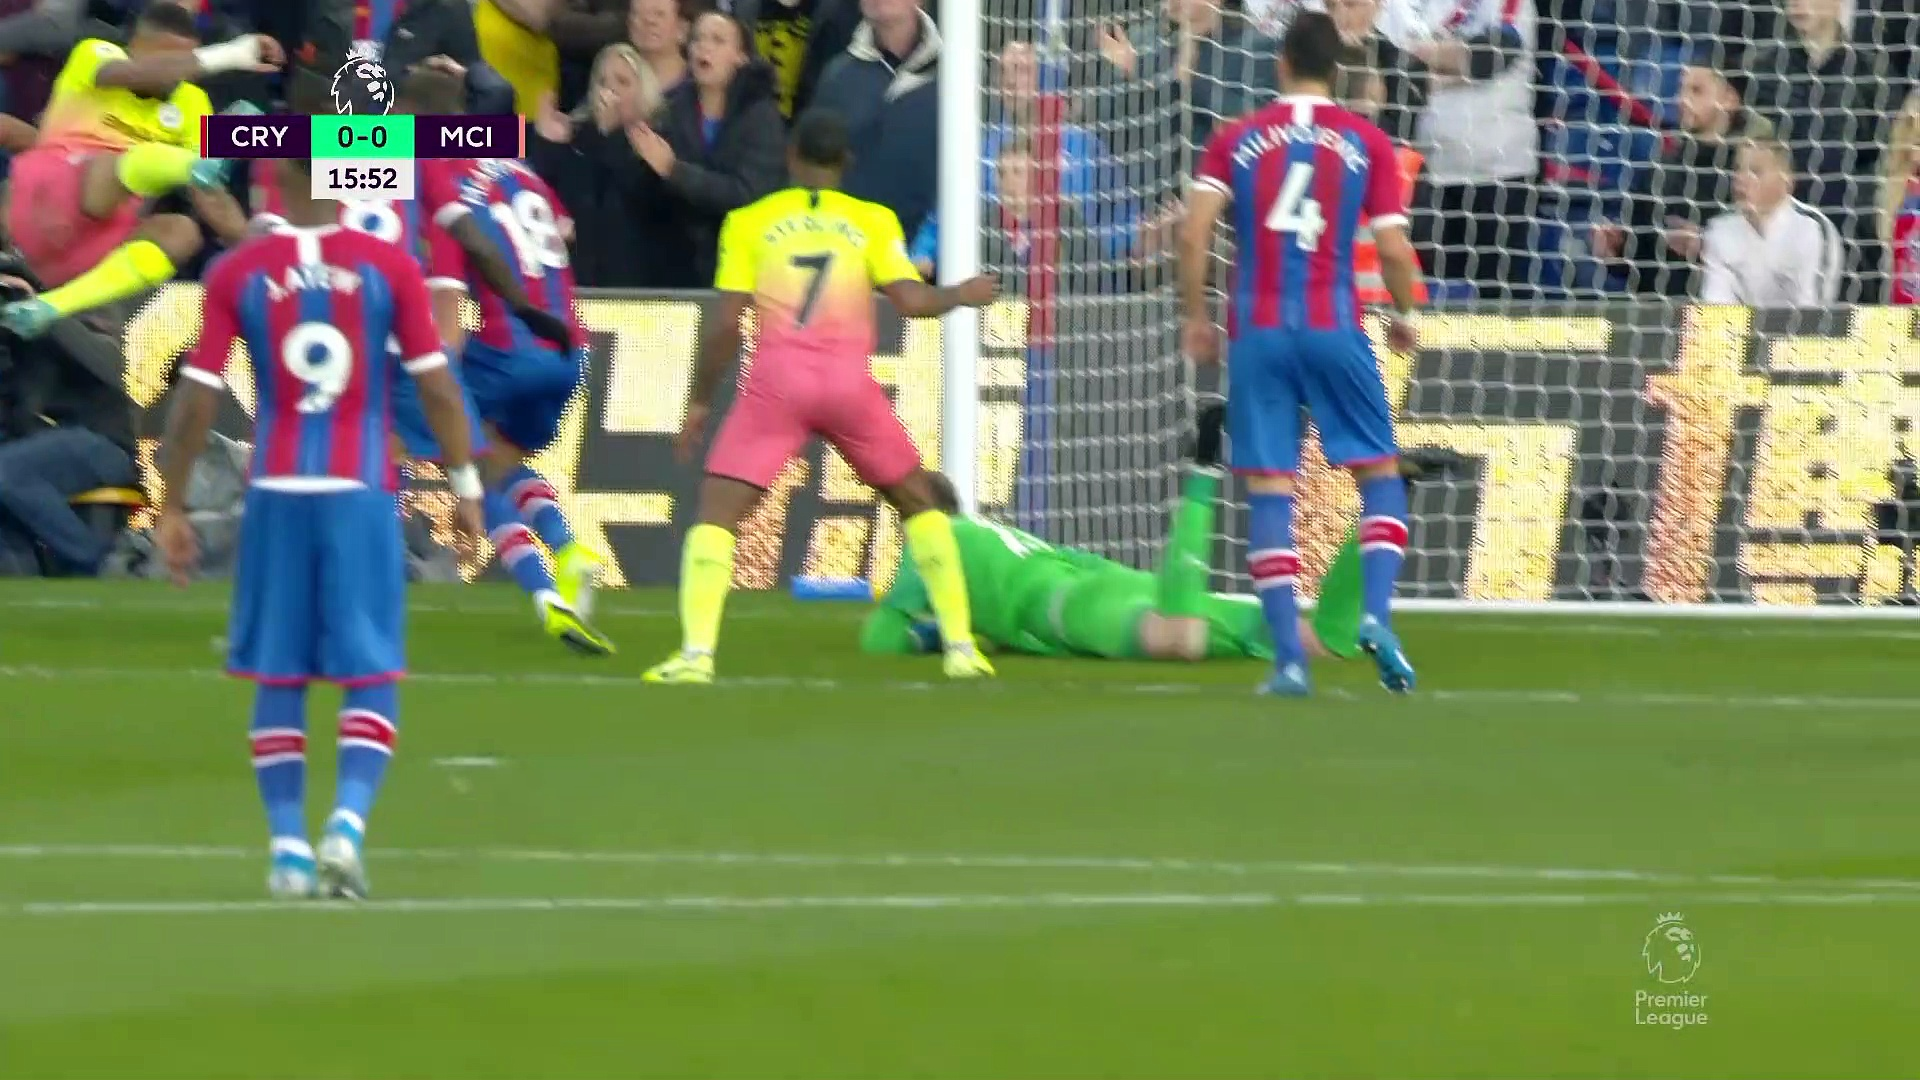 9. Hafta / Manchester City - Crystal Palace: 2-0 (Özet)